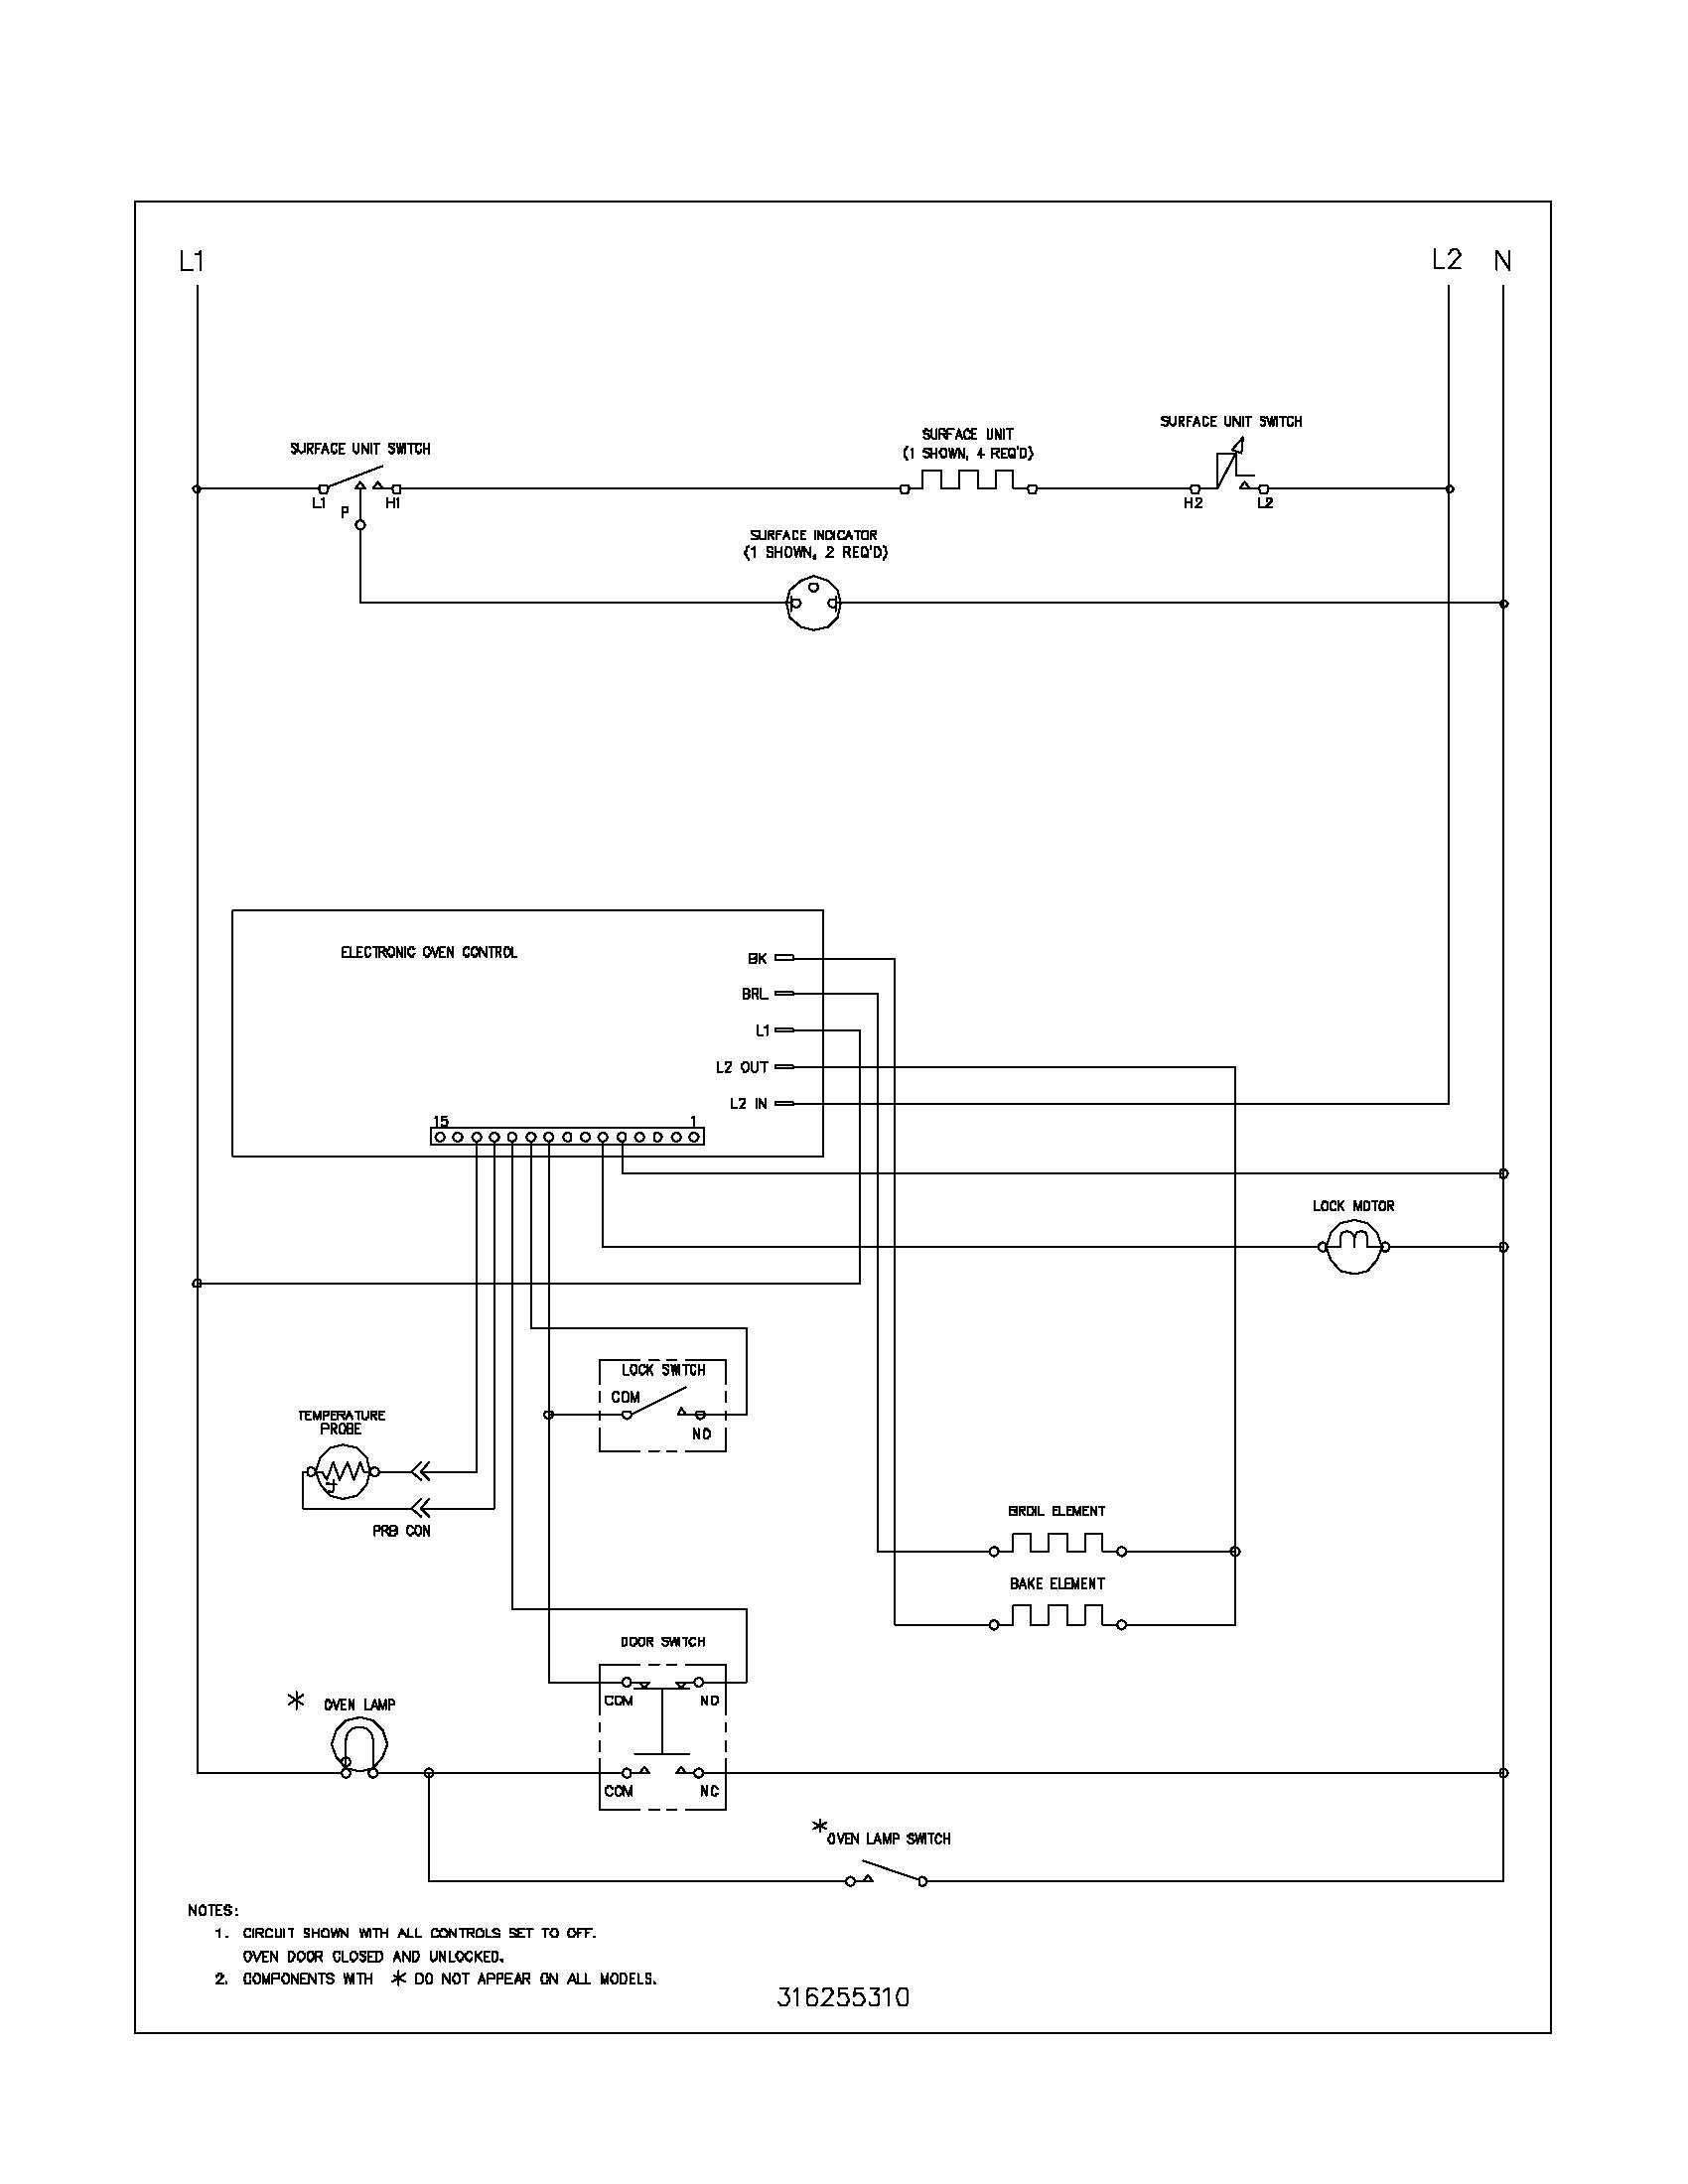 Renault Trafic Wiring Diagram | carlplant